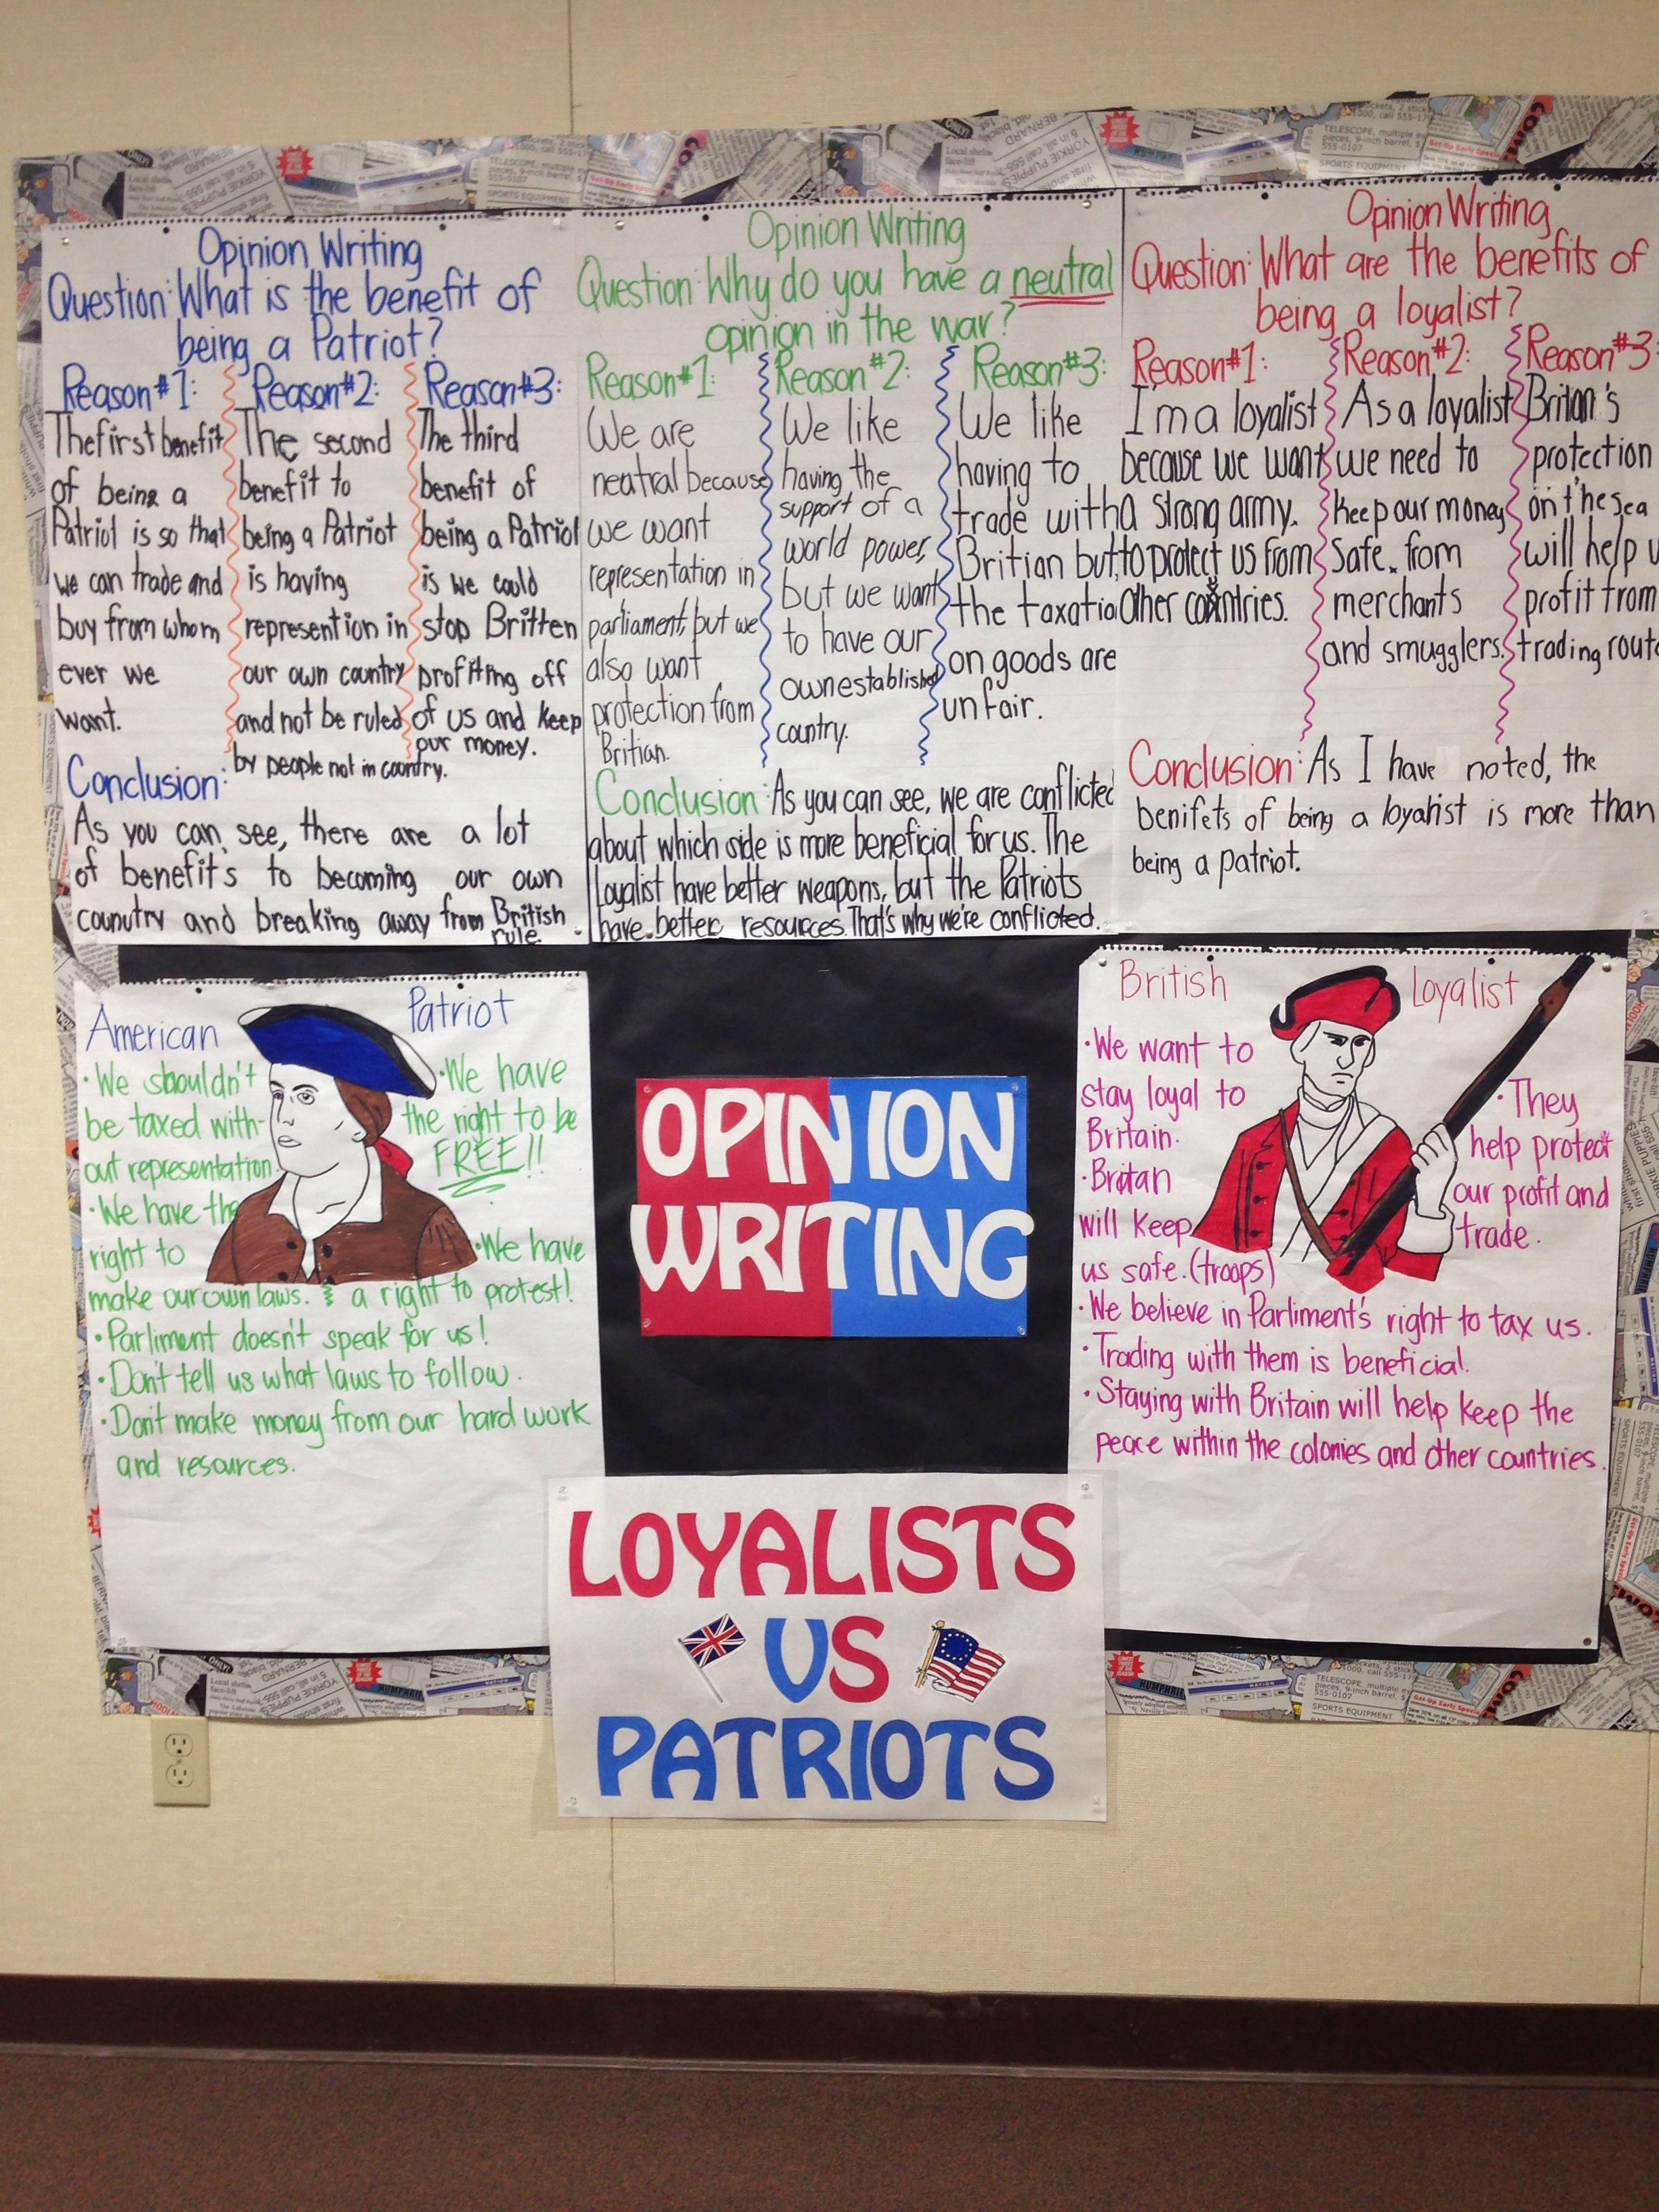 Loyalist Vs Patriots Group Opinion Writing Activity 7th Grade Social Studies Social Studies Elementary Social Studies Projects